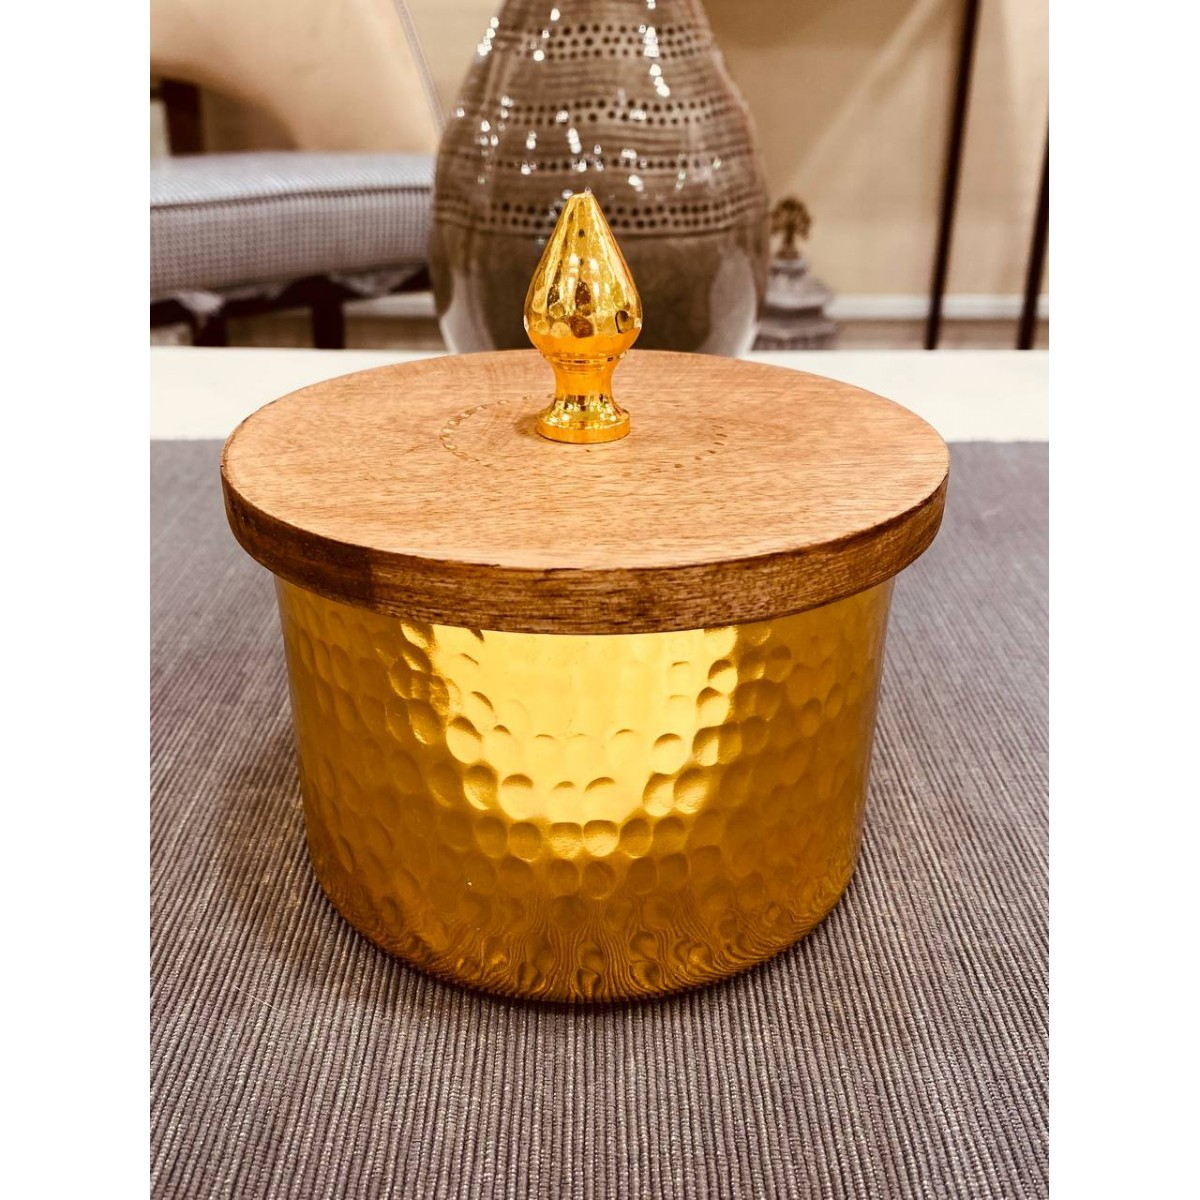 صحن حديد هندي ذهبي بغطاء خشب11*15سم